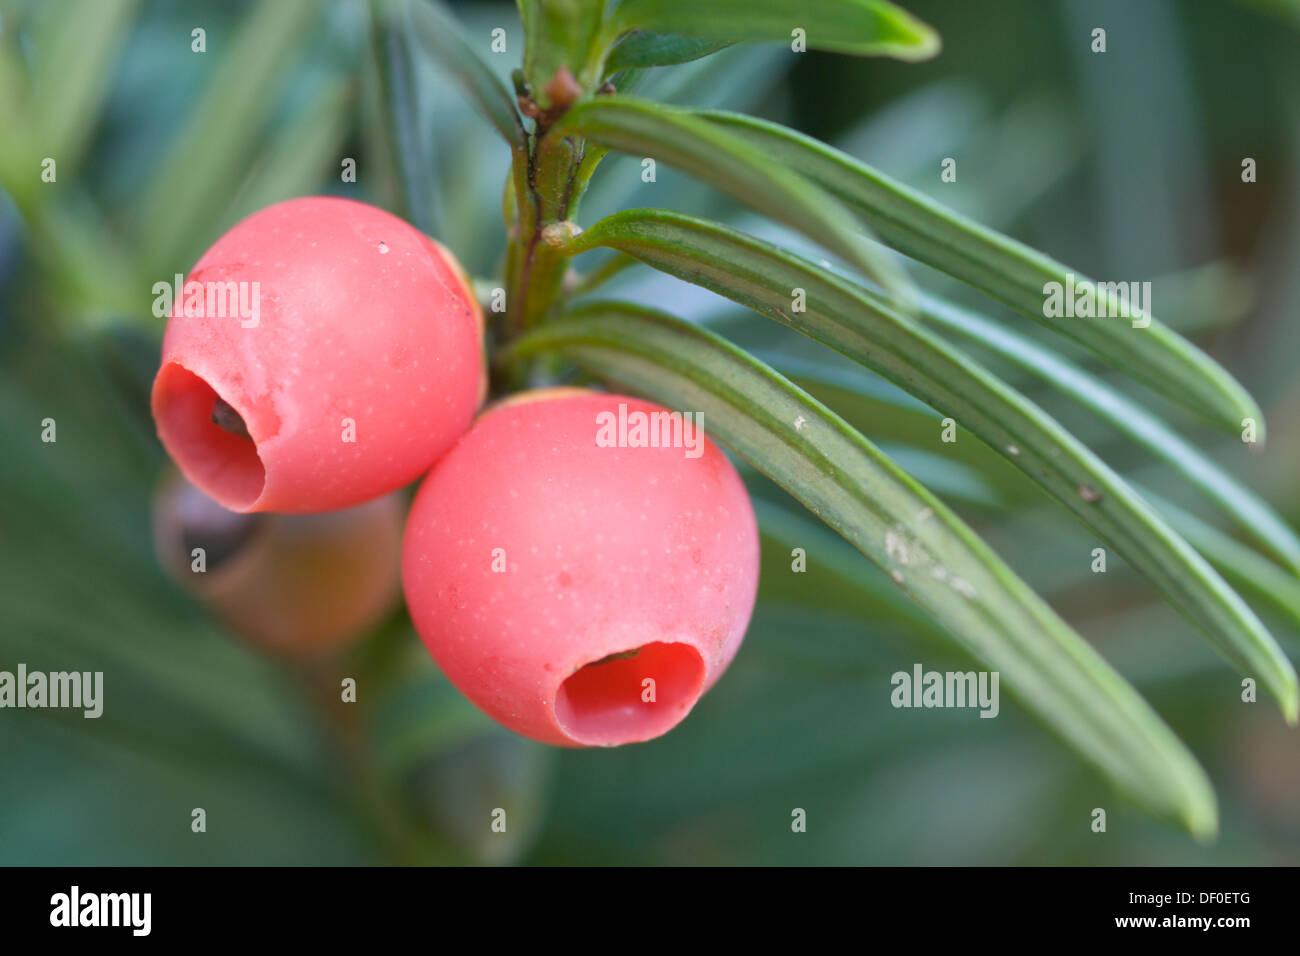 Yew (Taxus baccata), fruits, Haren, Emsland region, Lower Saxony - Stock Image